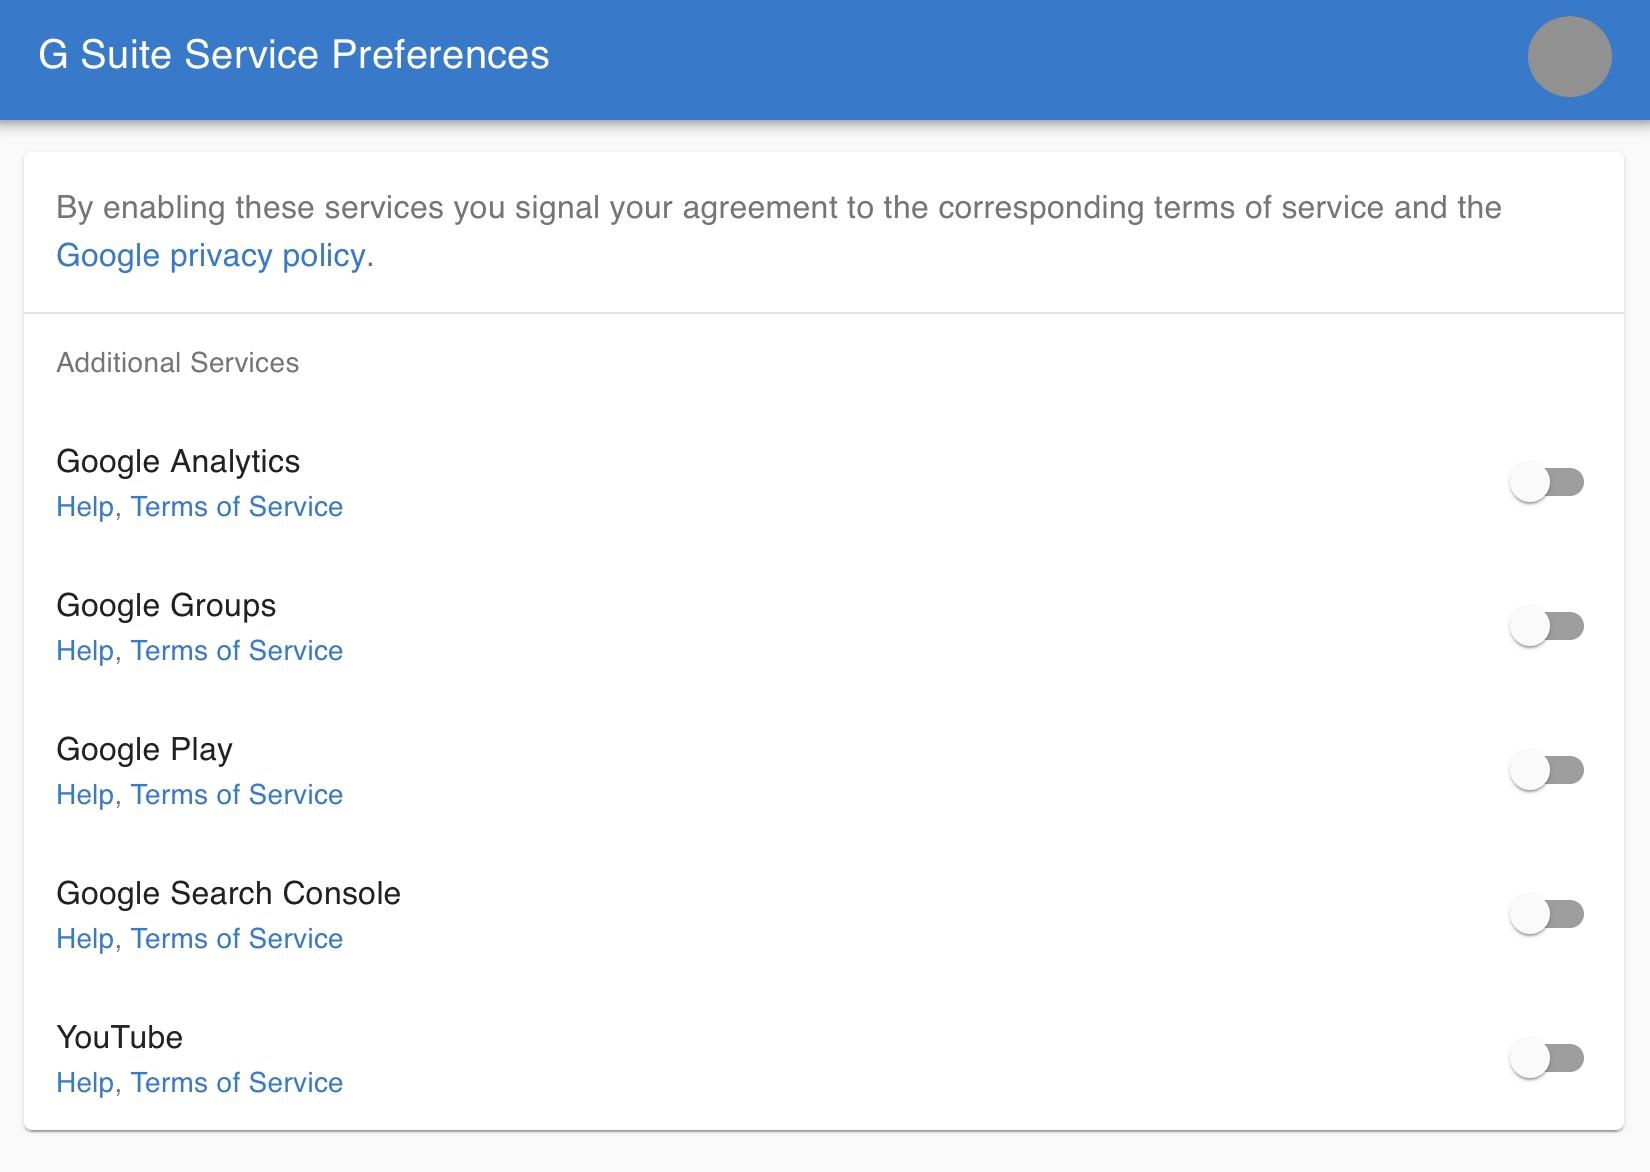 G Suite Preferences window